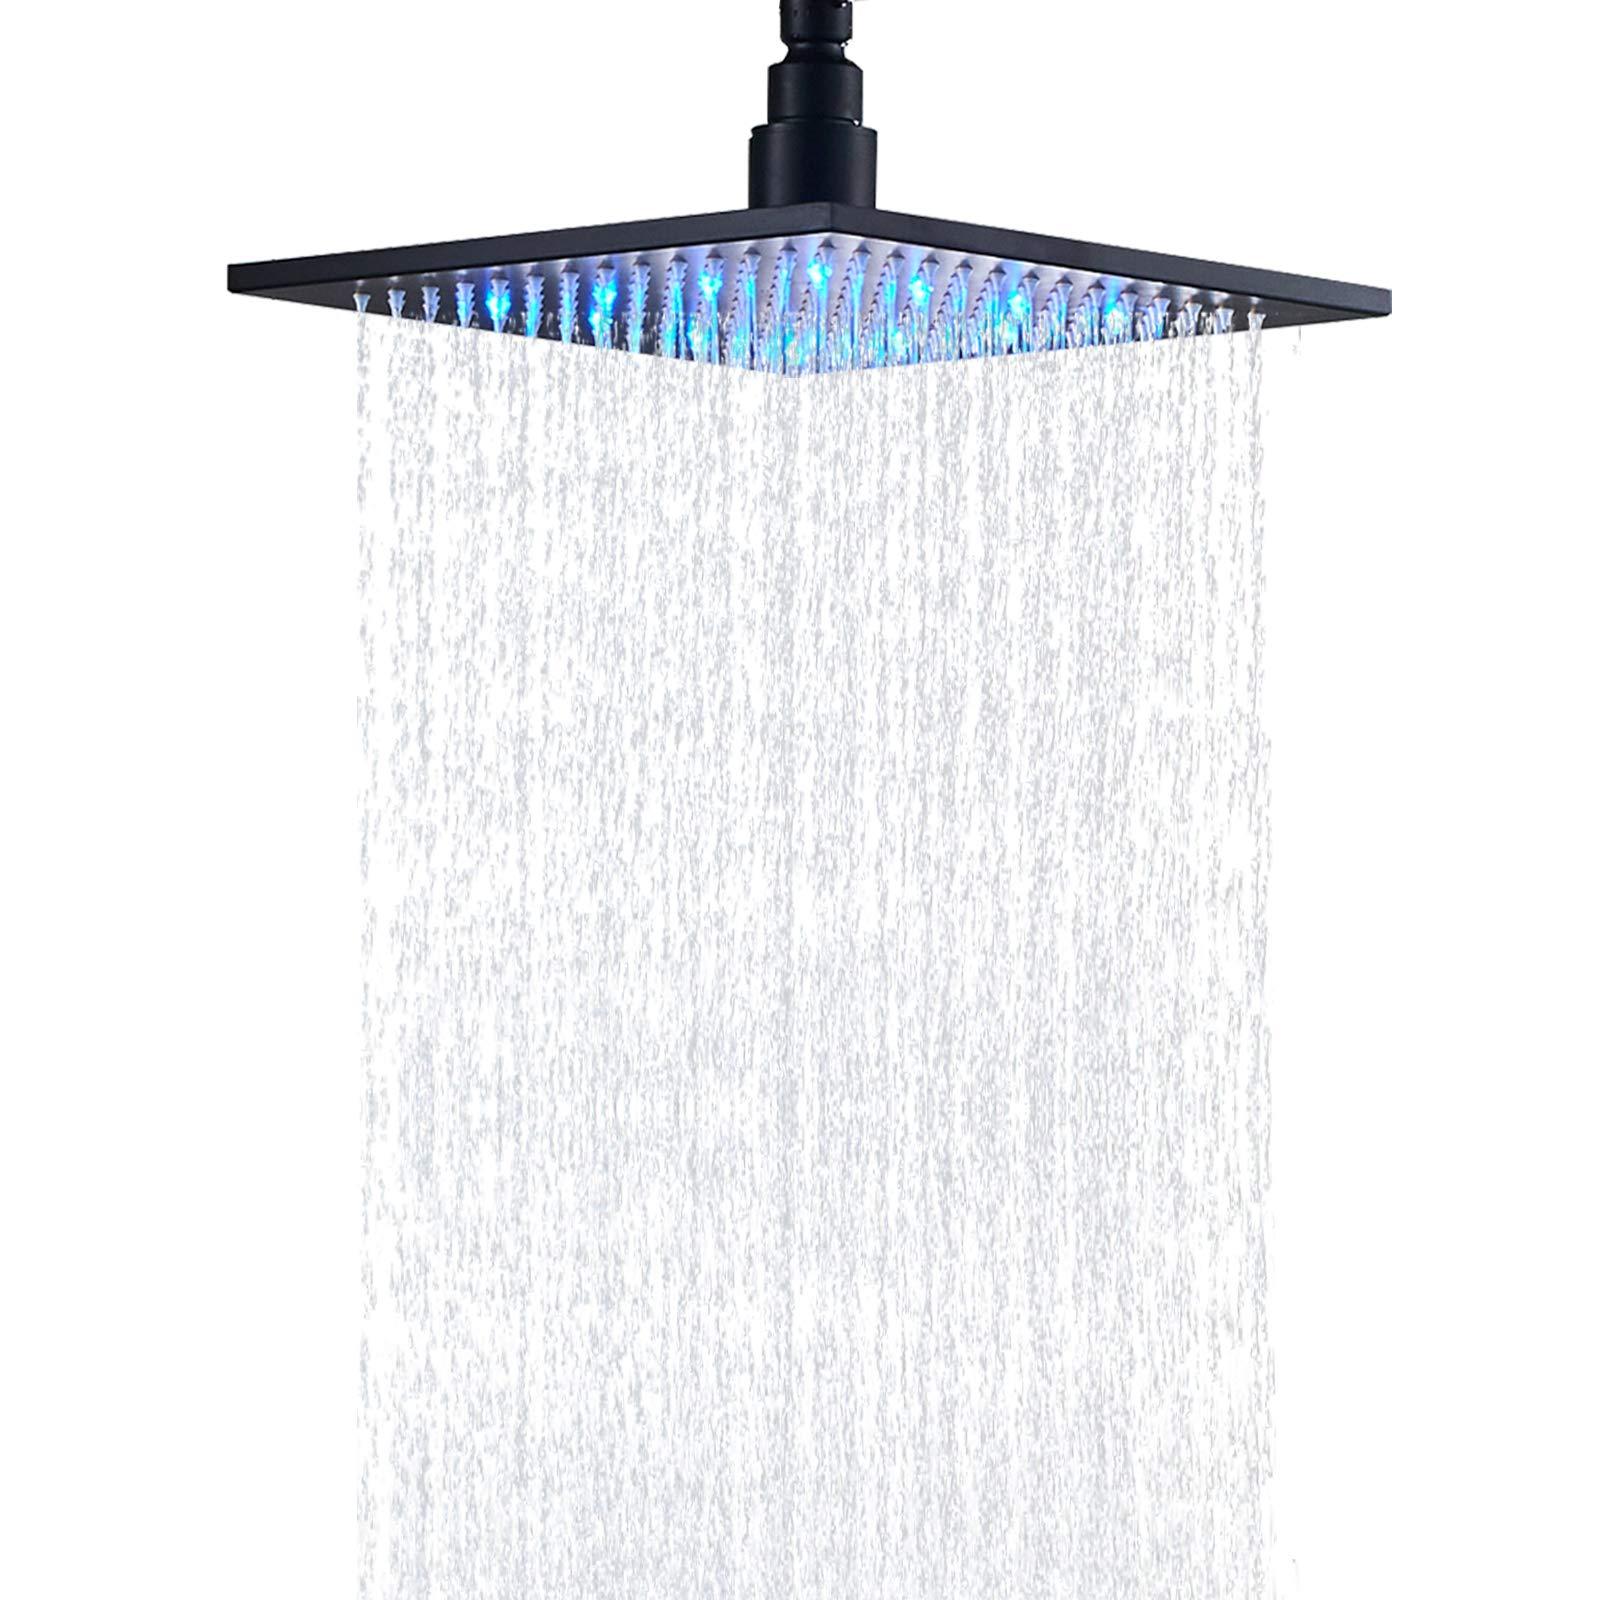 Senlesen Bathroom 10-inch Square Shower Head with LED Light Oil Rubbed Bronze by Senlesen